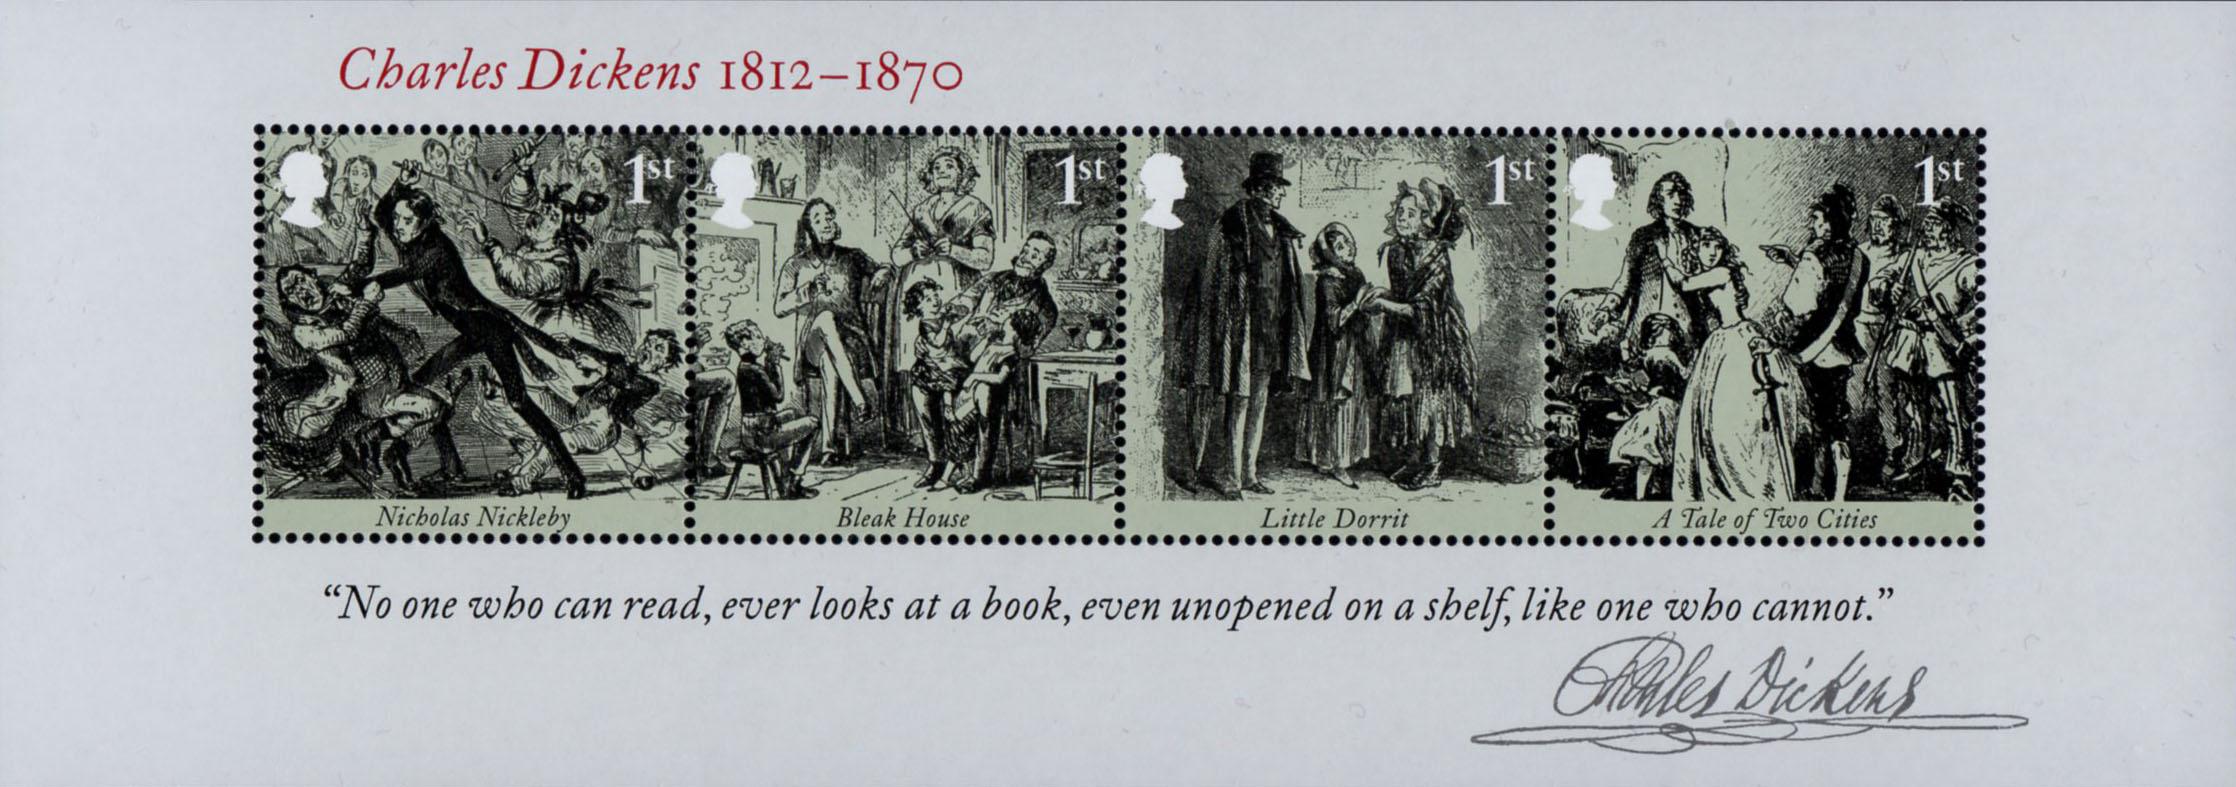 Great Britain - Scott #3043 (2012) miniature sheet of 4